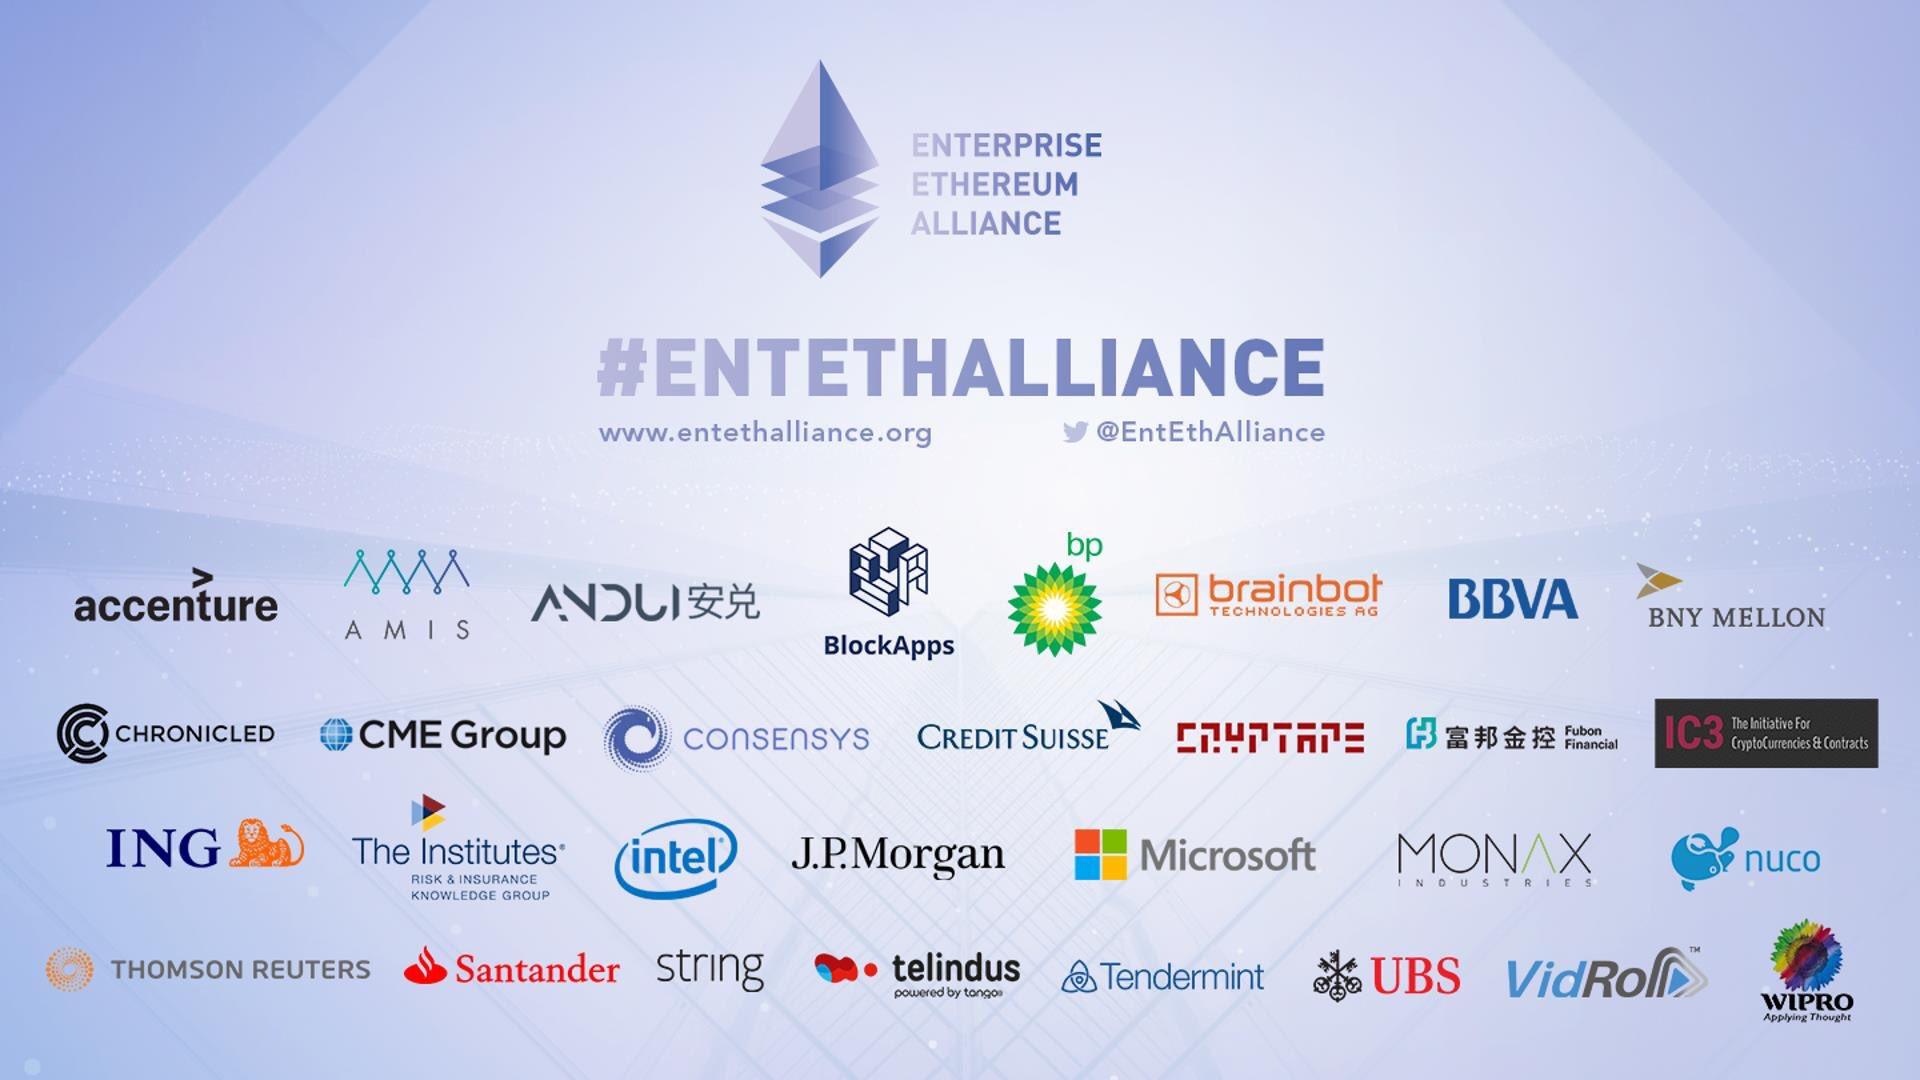 EnterpriseEthereumAlliance